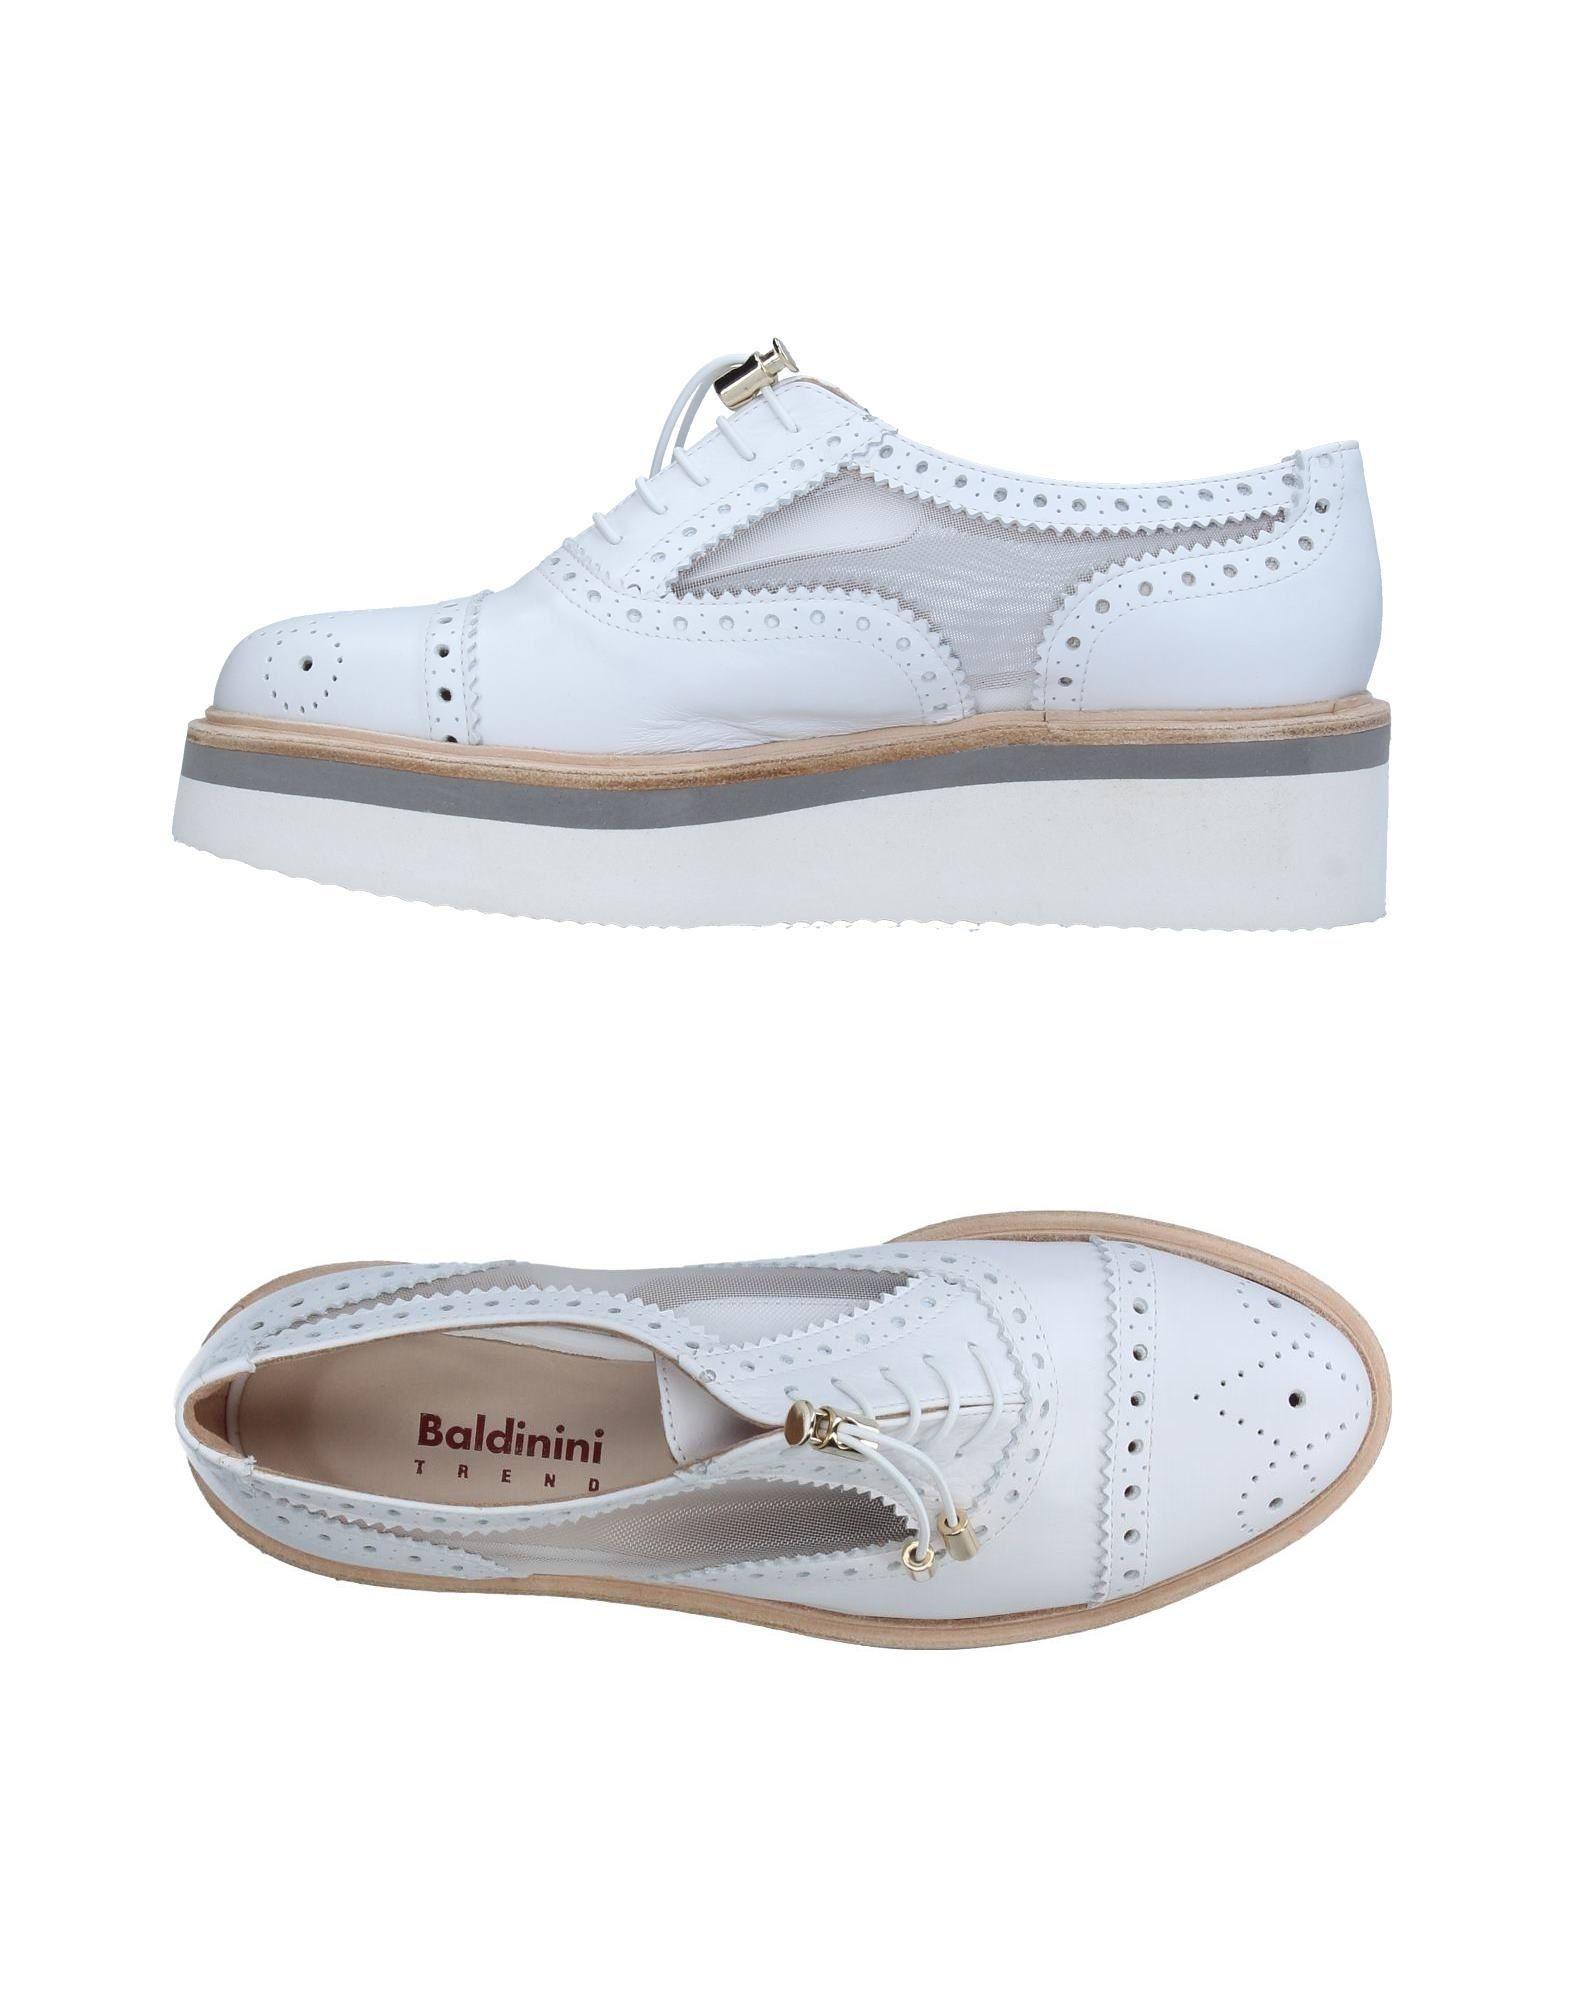 Baldinini Trend Schnürschuhe Damen  11330664FL Gute Qualität beliebte Schuhe